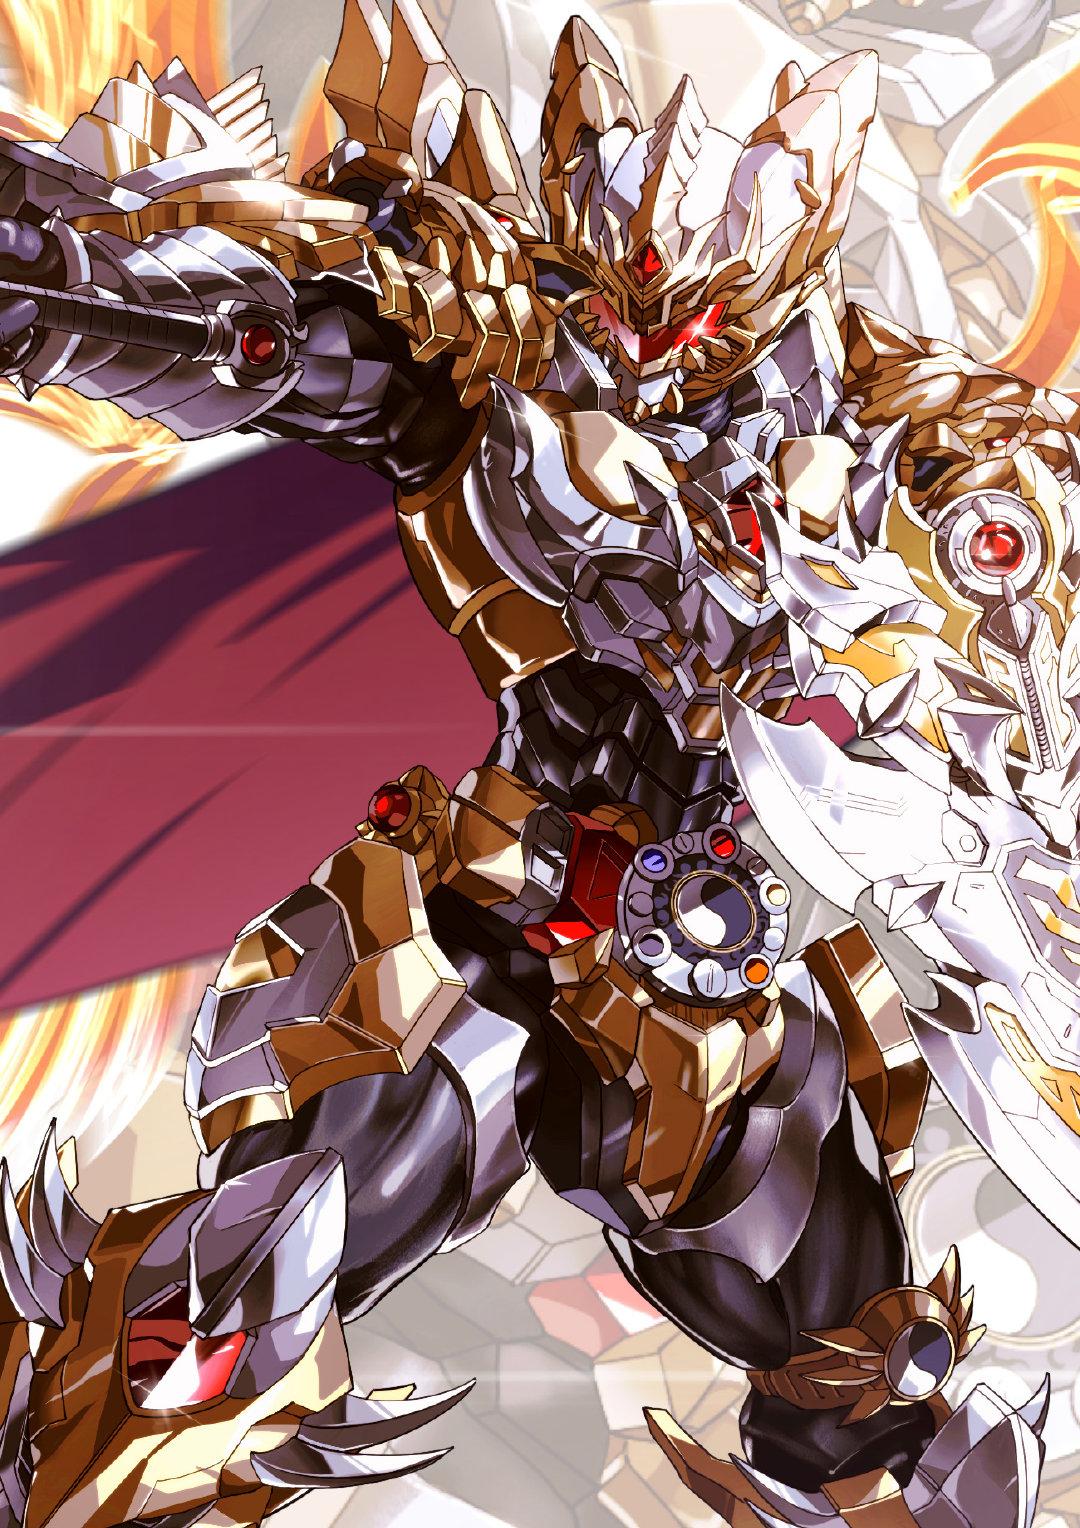 S535_Armor_hero_Emperor_025.jpg